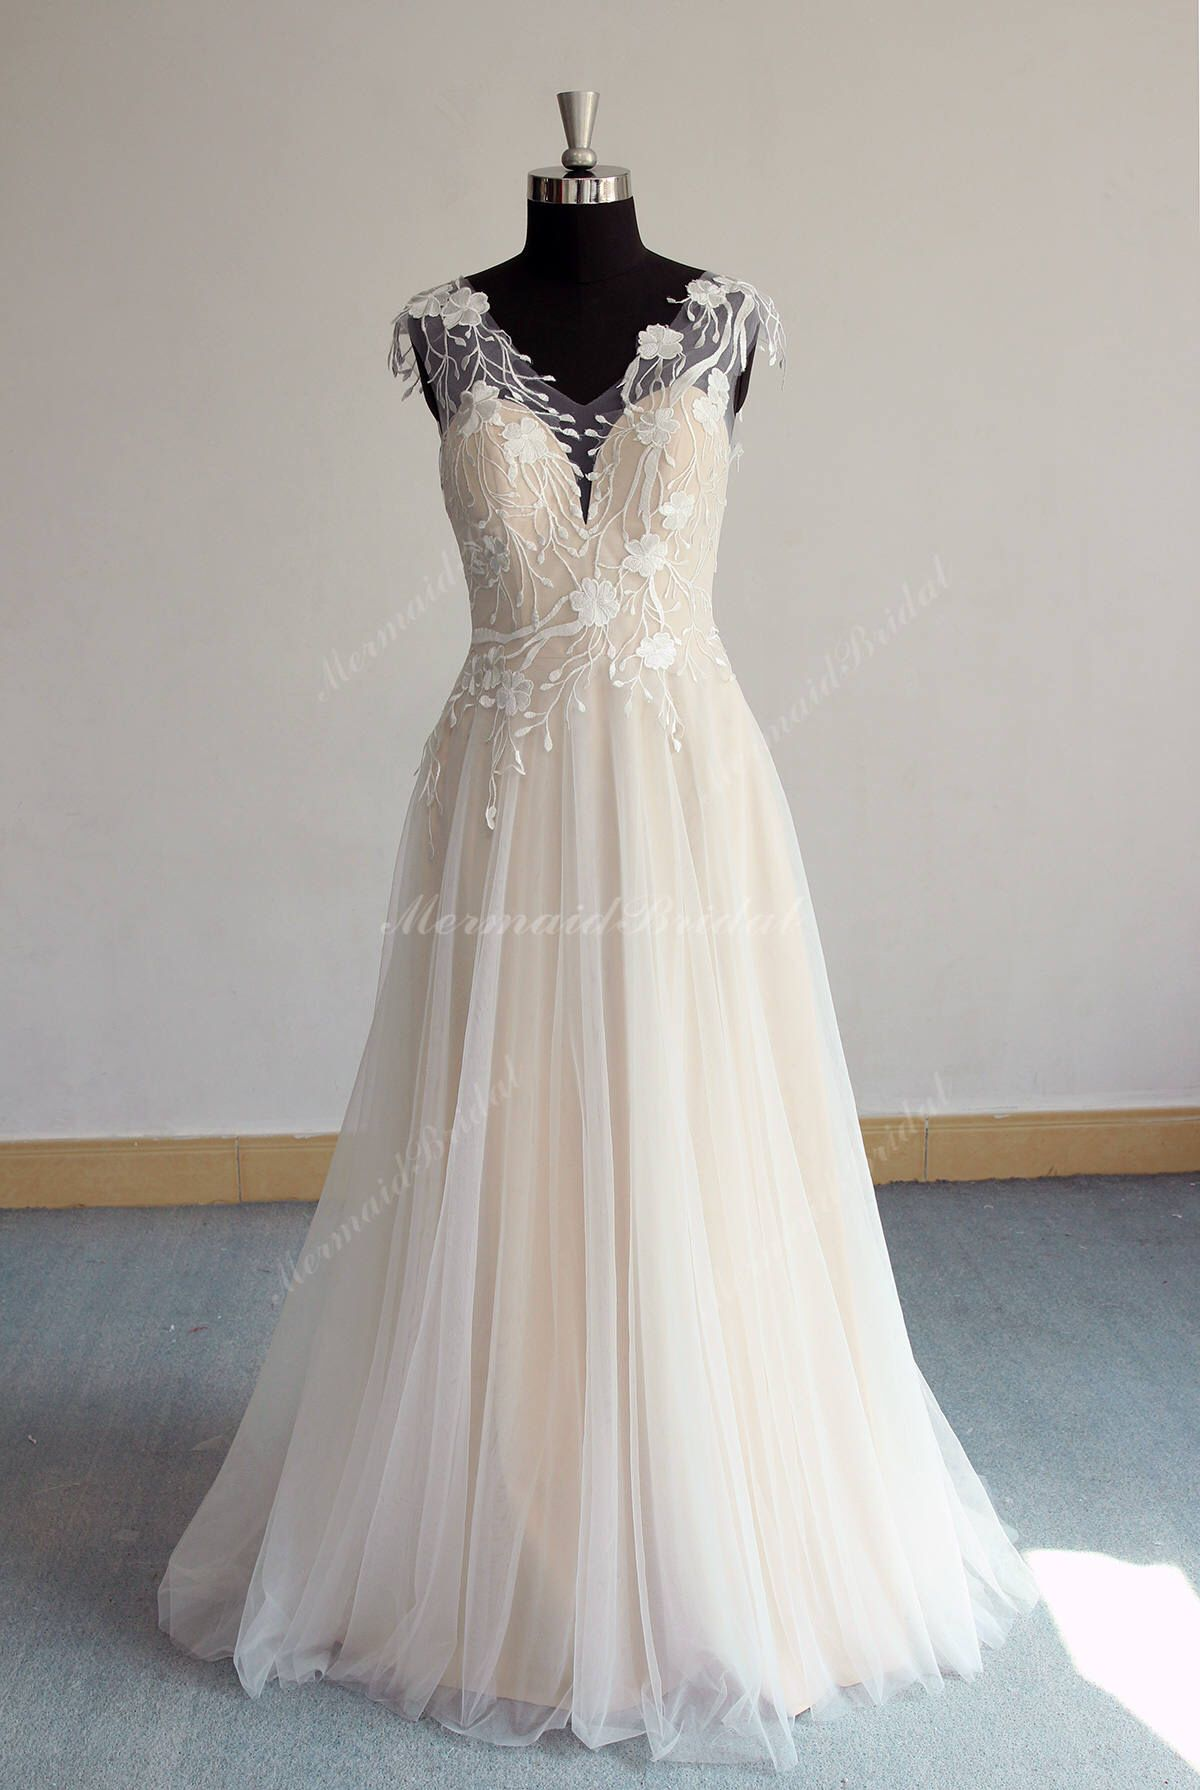 e18675d7dbb5 Unique Open Back Aline Tulle Lace Wedding Dress, Elegant Vintage Boho  Wedding Dress, Blush